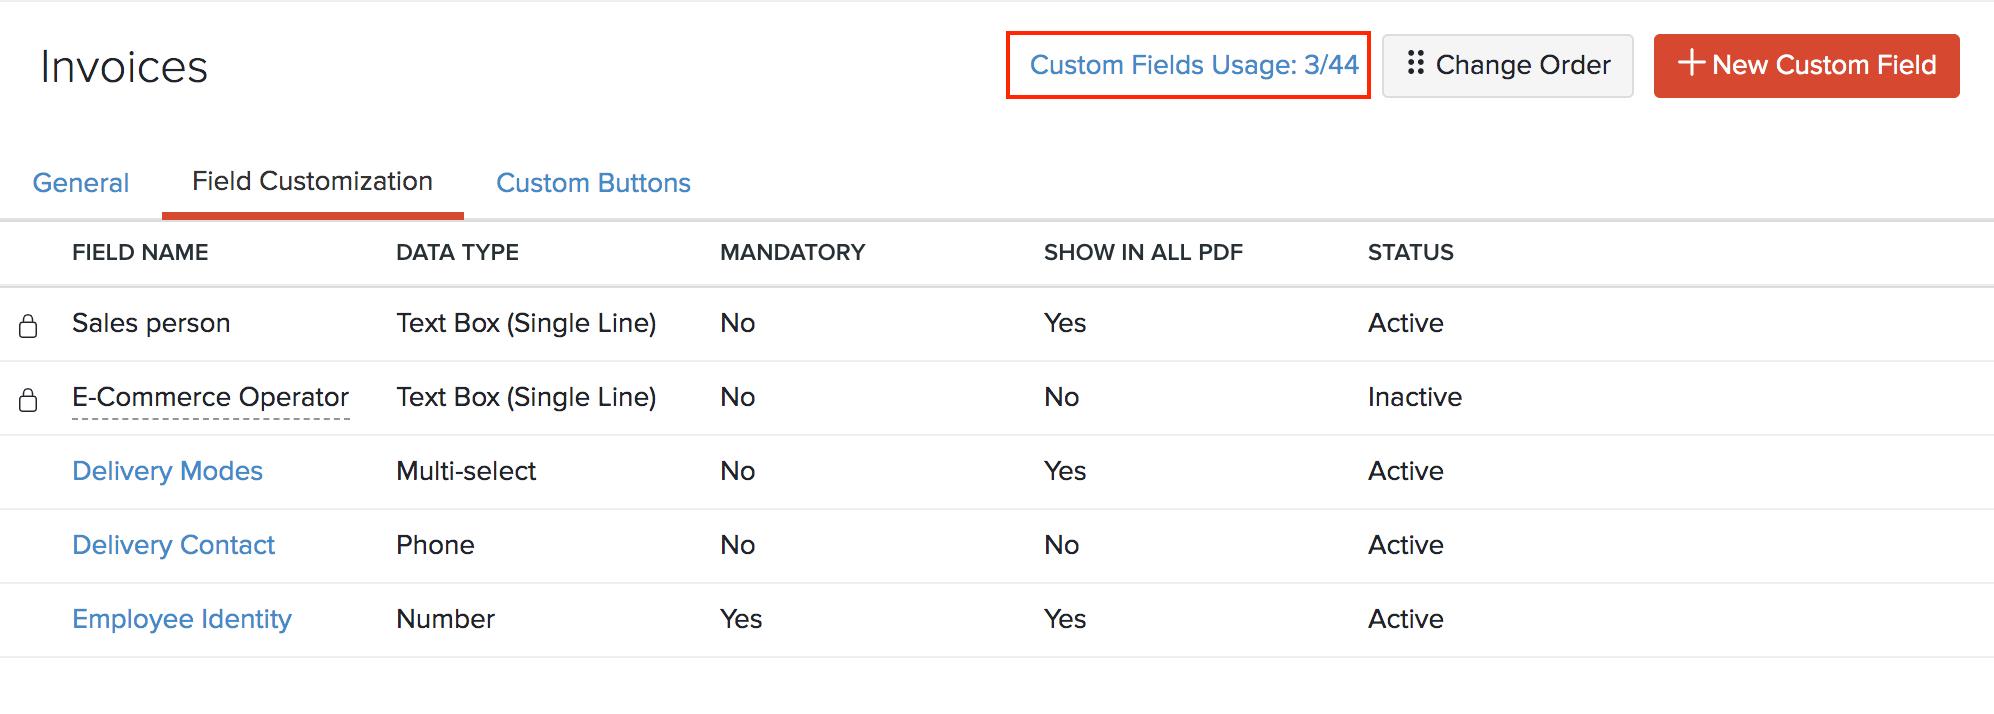 Custom Field Usage